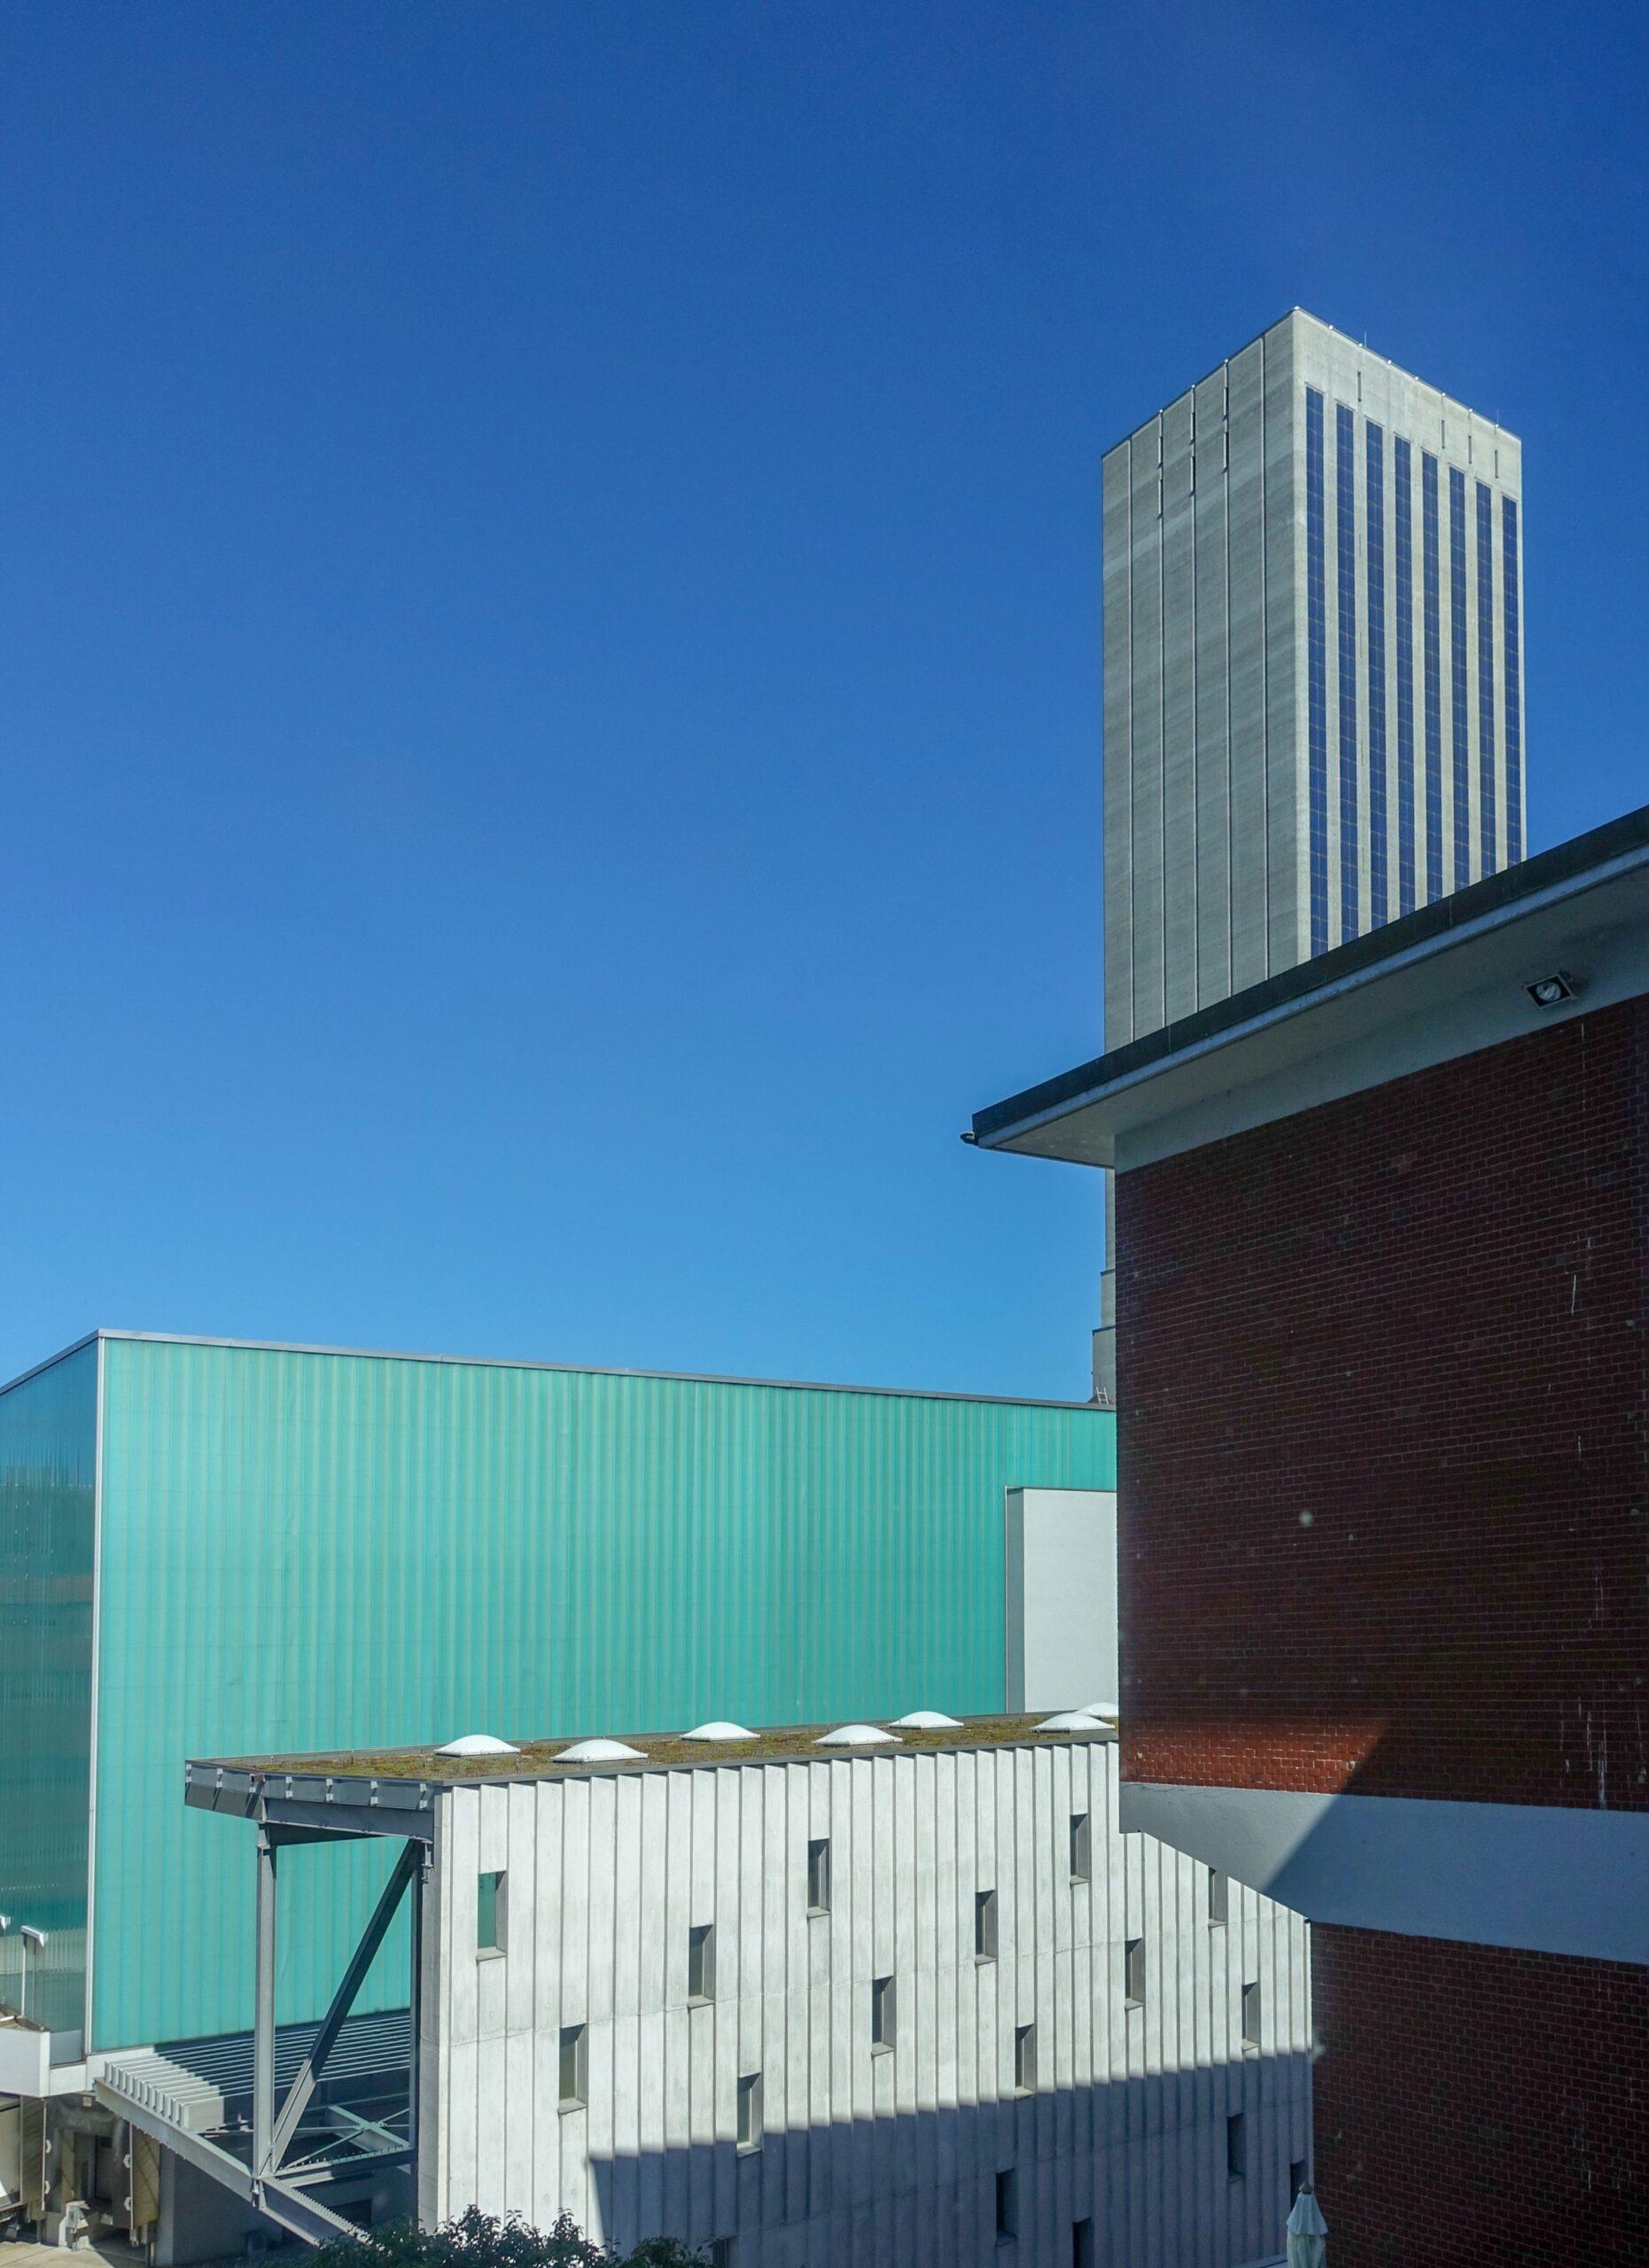 zurich contemporary art - migros museum